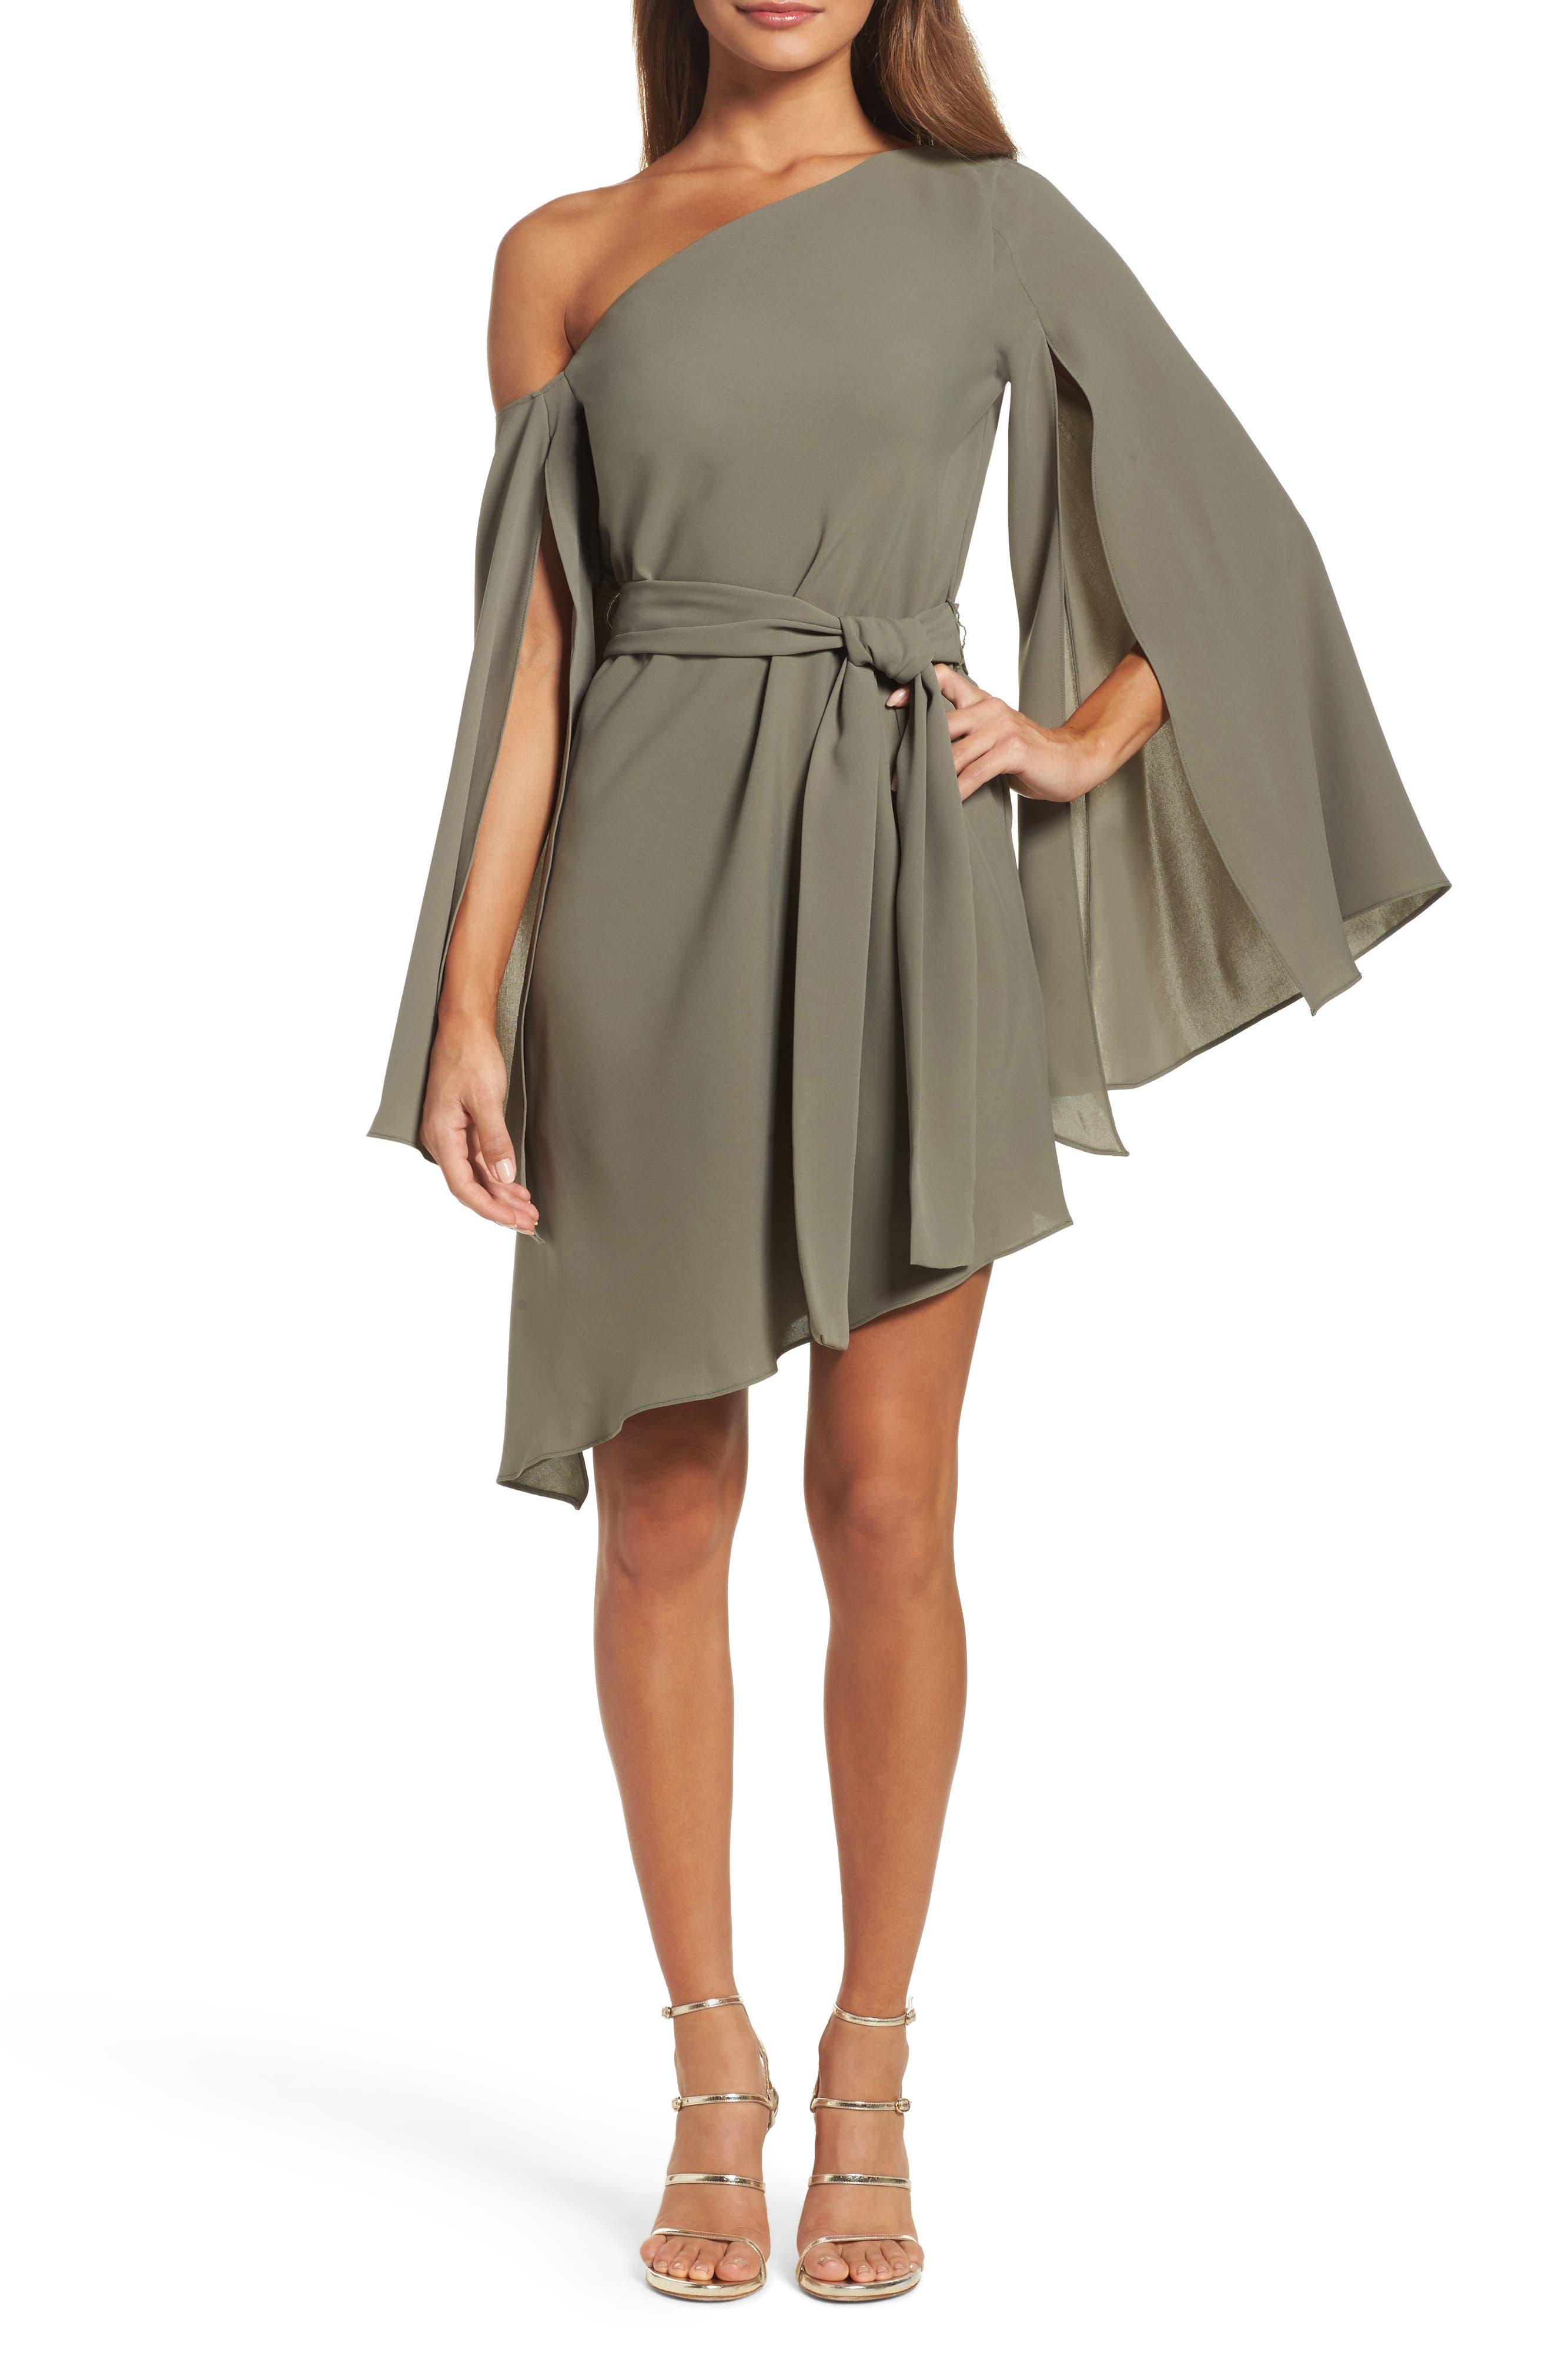 Beyond Me One-Shoulder Dress,                         Main,                         color, Khaki